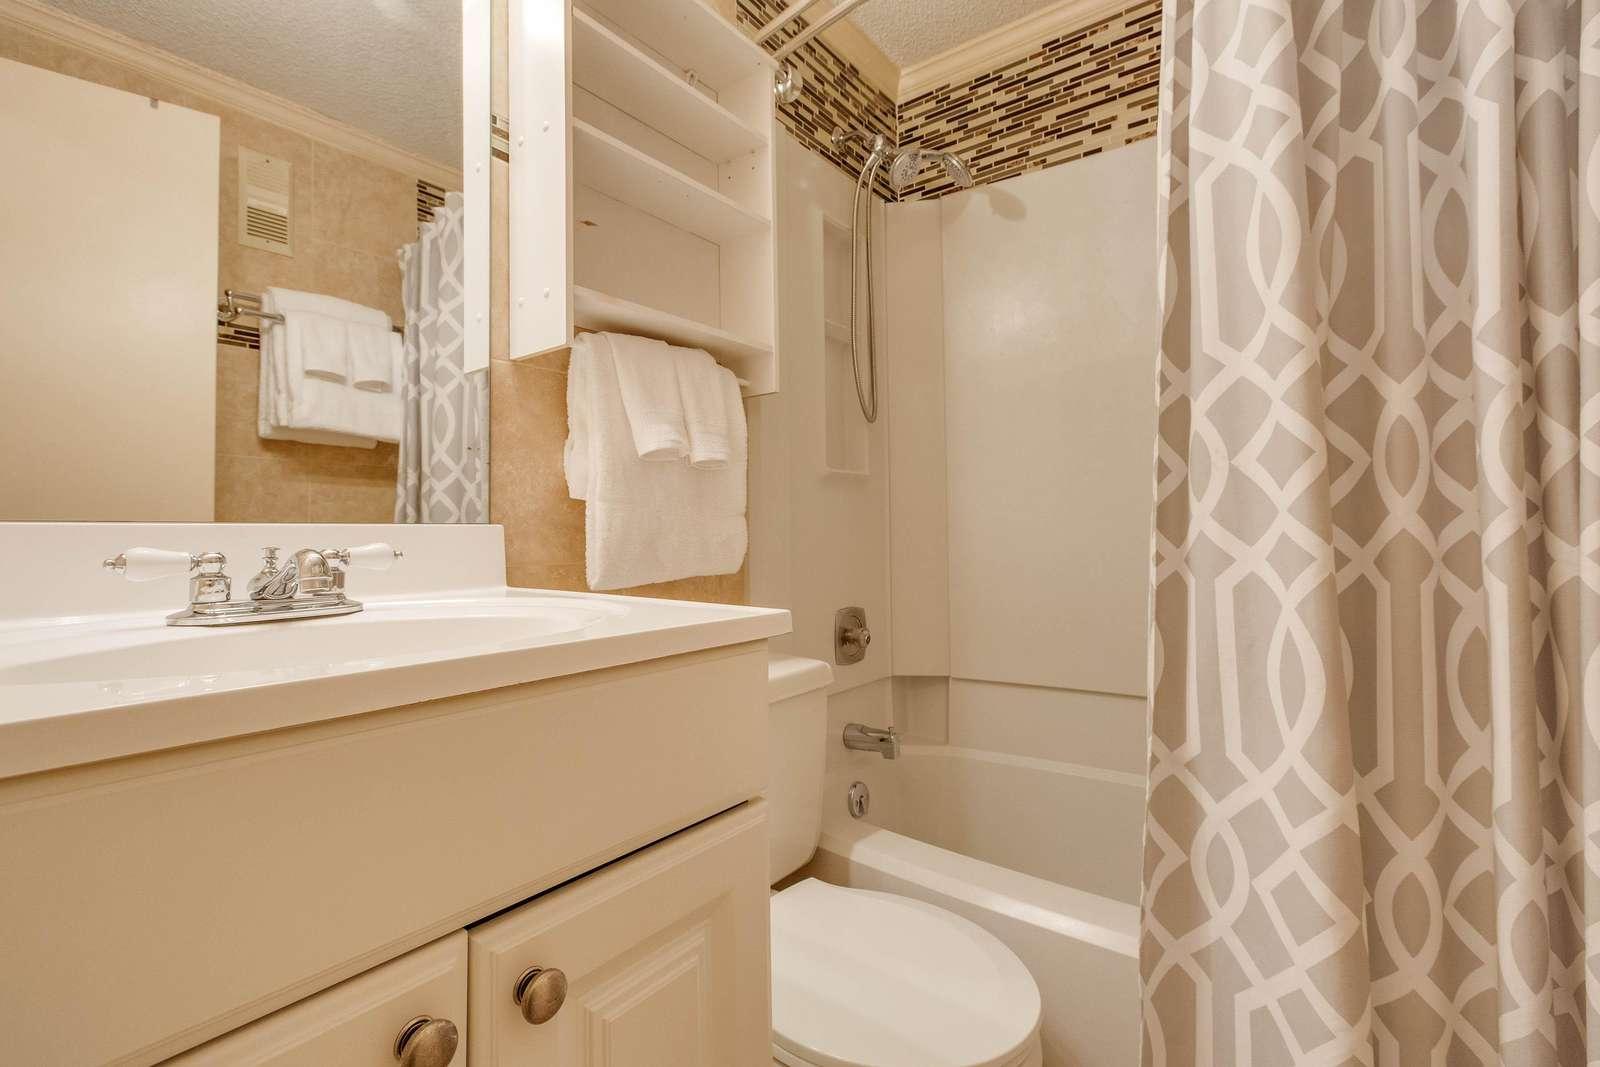 Clean & Tidy Bathroom